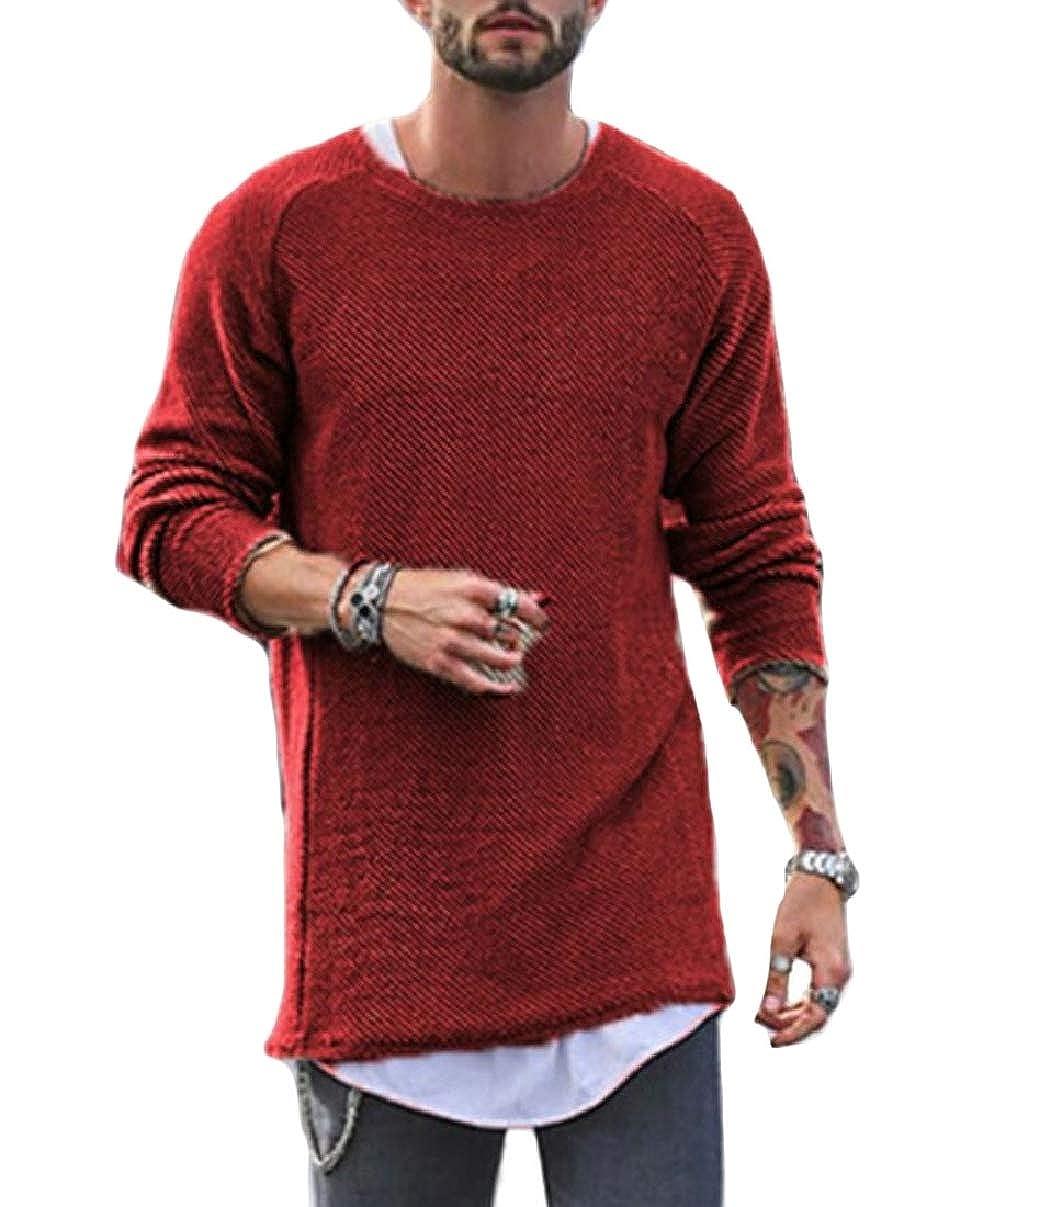 ZXFHZS Men Fashion Raglan Sleeve Slim Fit Knitting Round Neck Pullover Sweaters